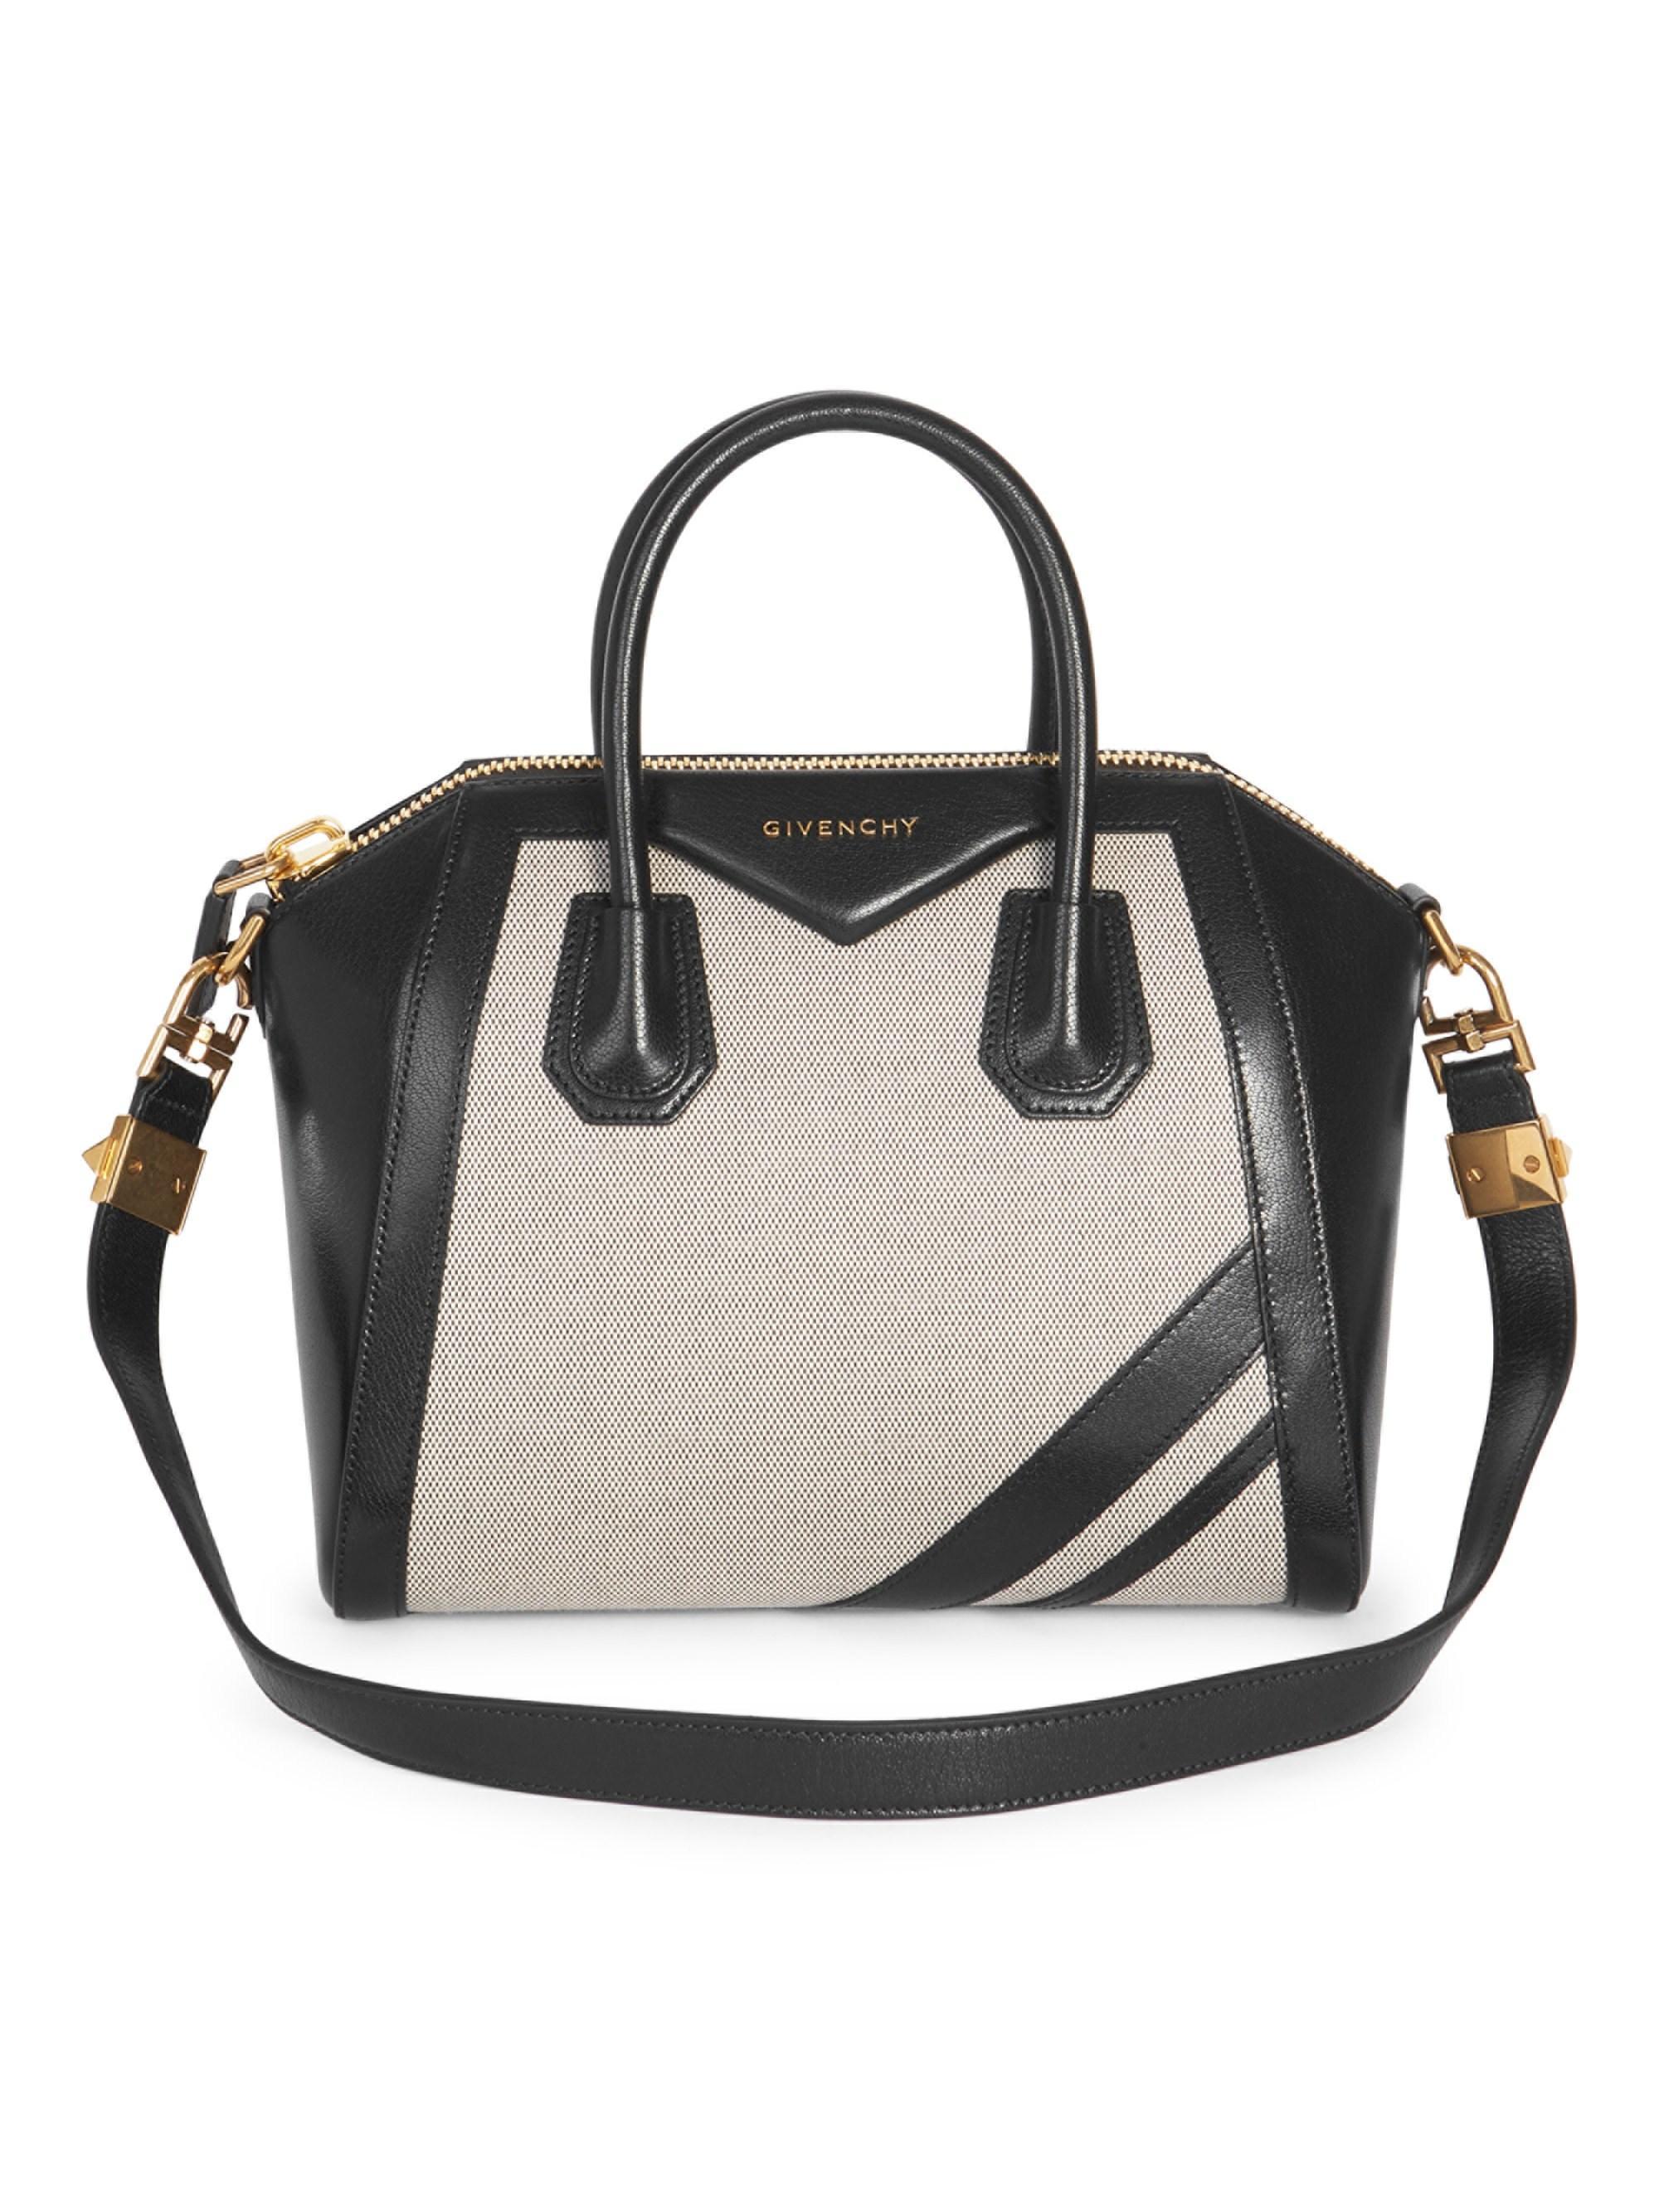 437734264e0b Givenchy - Black Leather   Canvas Stripe Antigona Bag - Lyst. View  fullscreen